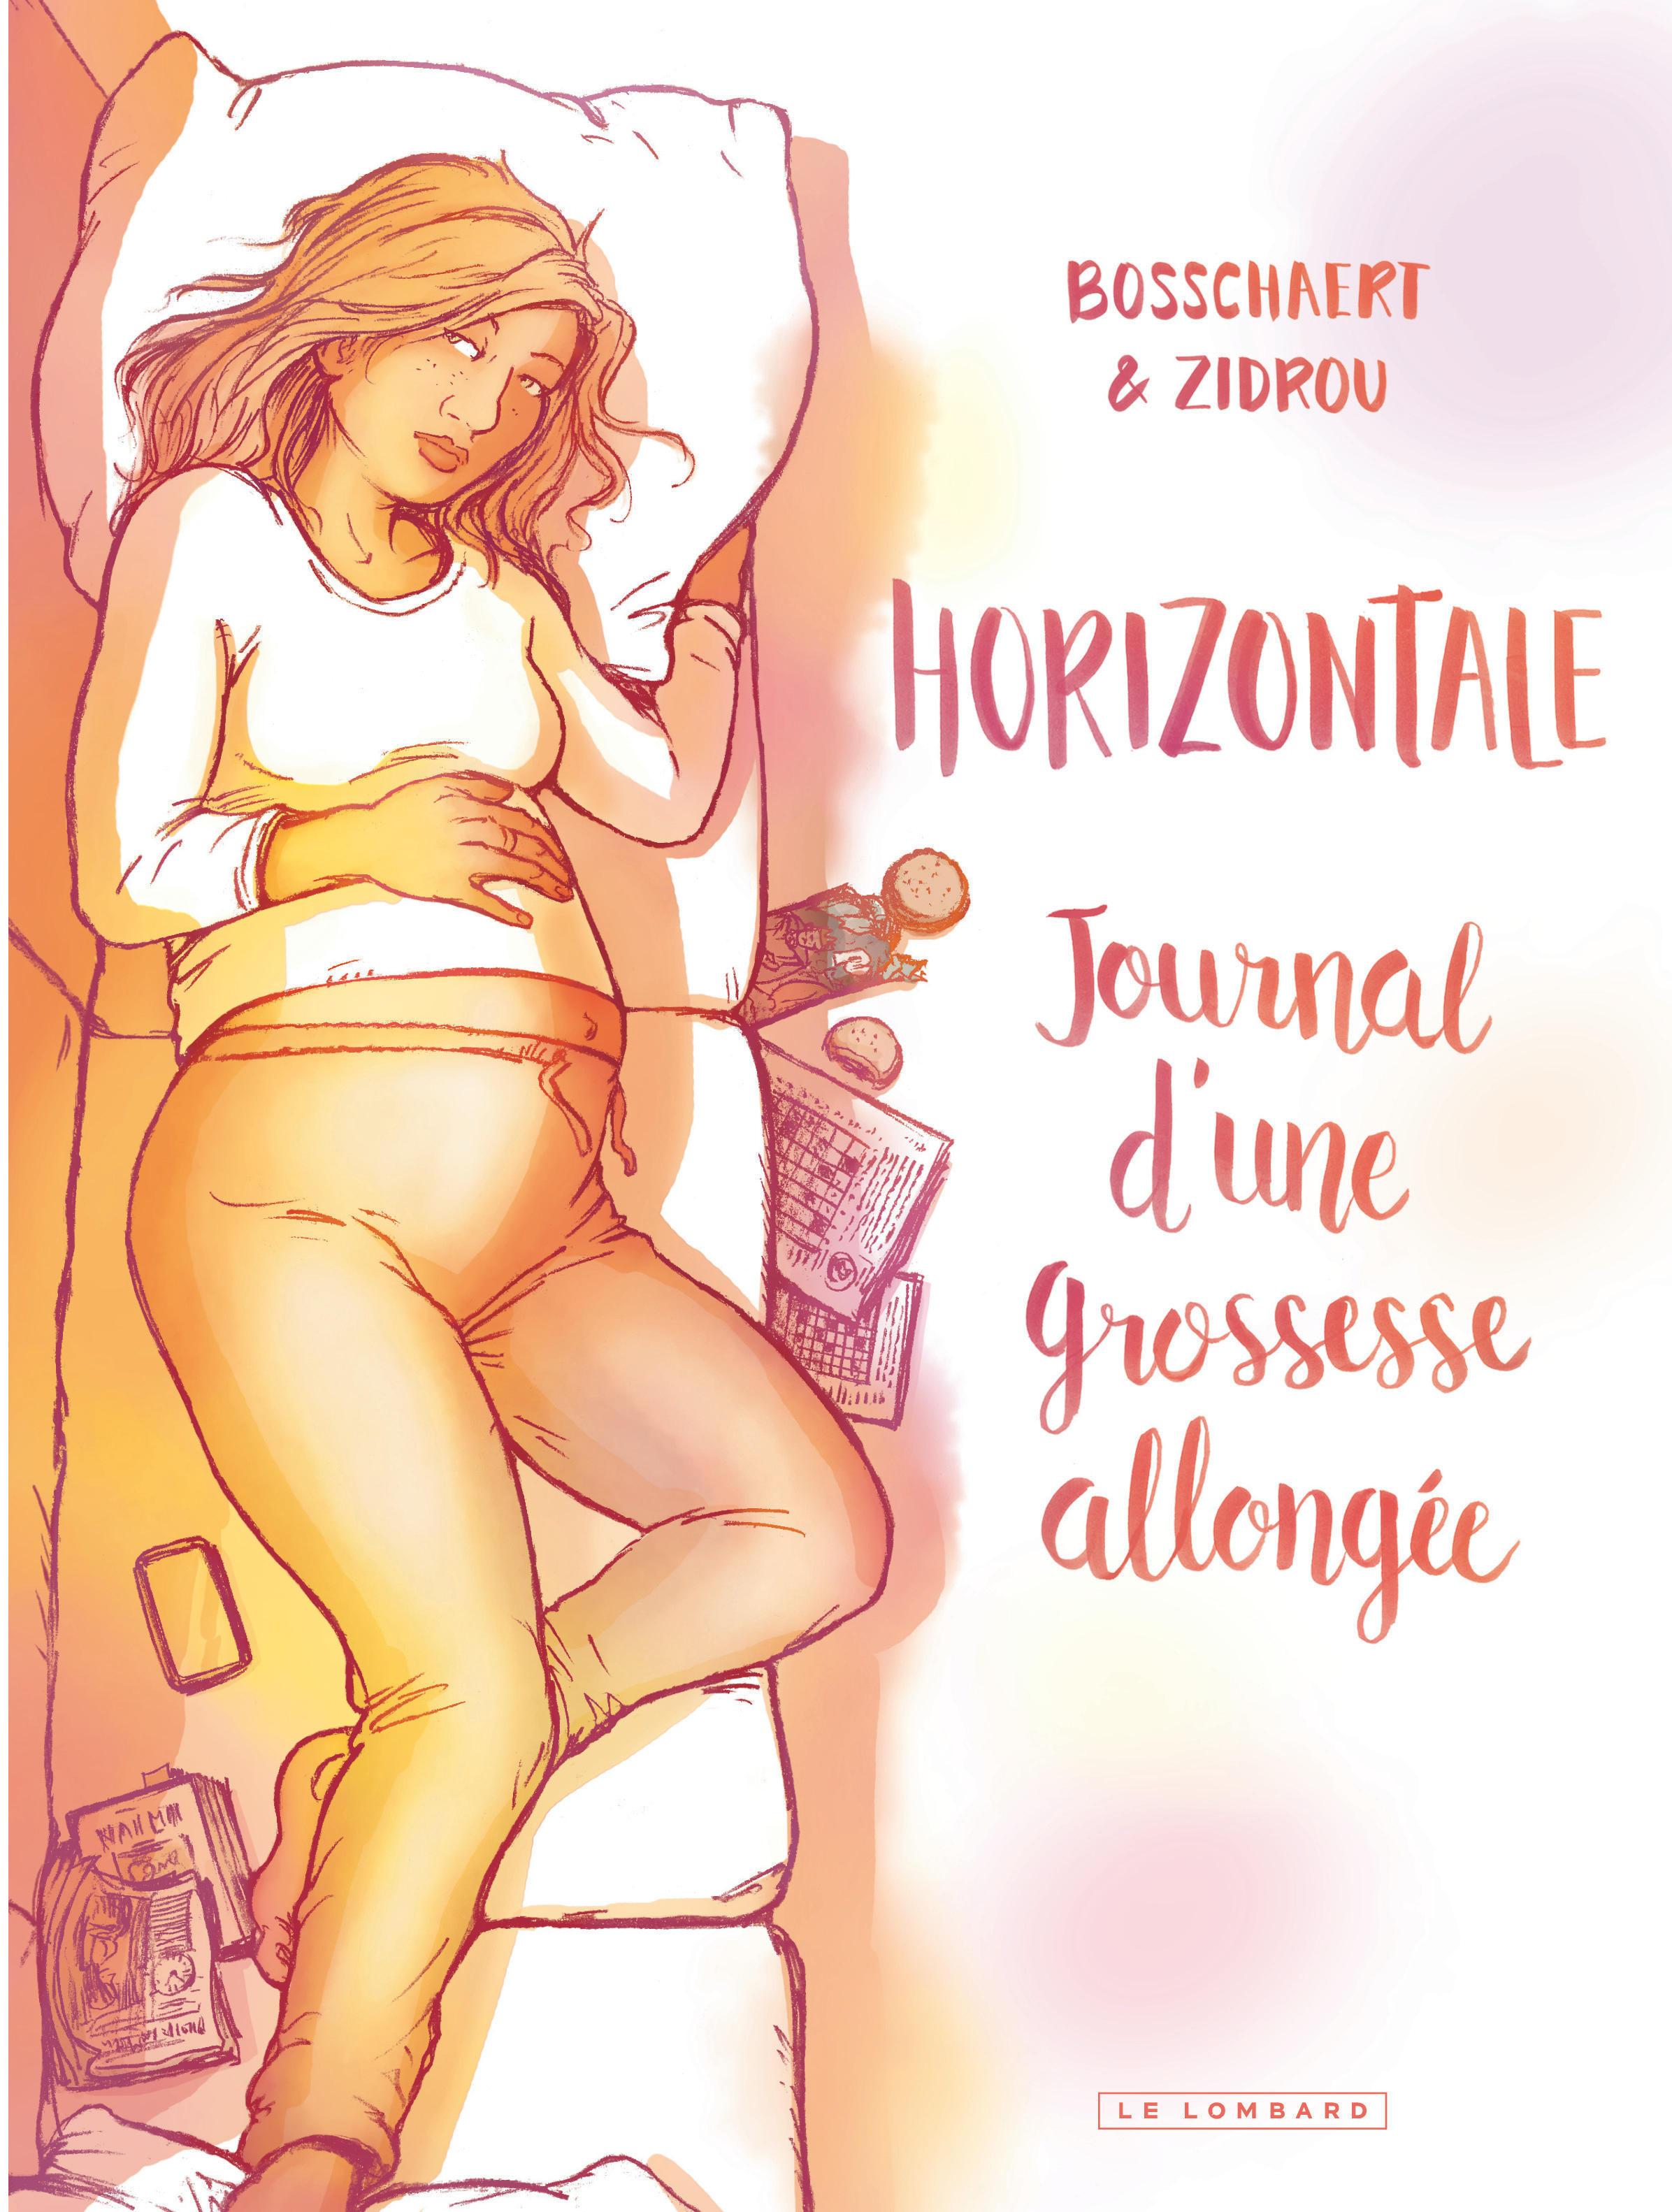 HORIZONTALE JOURNAL D'UNE GROS - HORIZONTALE. JOURNAL D'UNE GROSSESSE ALLONGEE. - TOME 0 - HORIZONTA